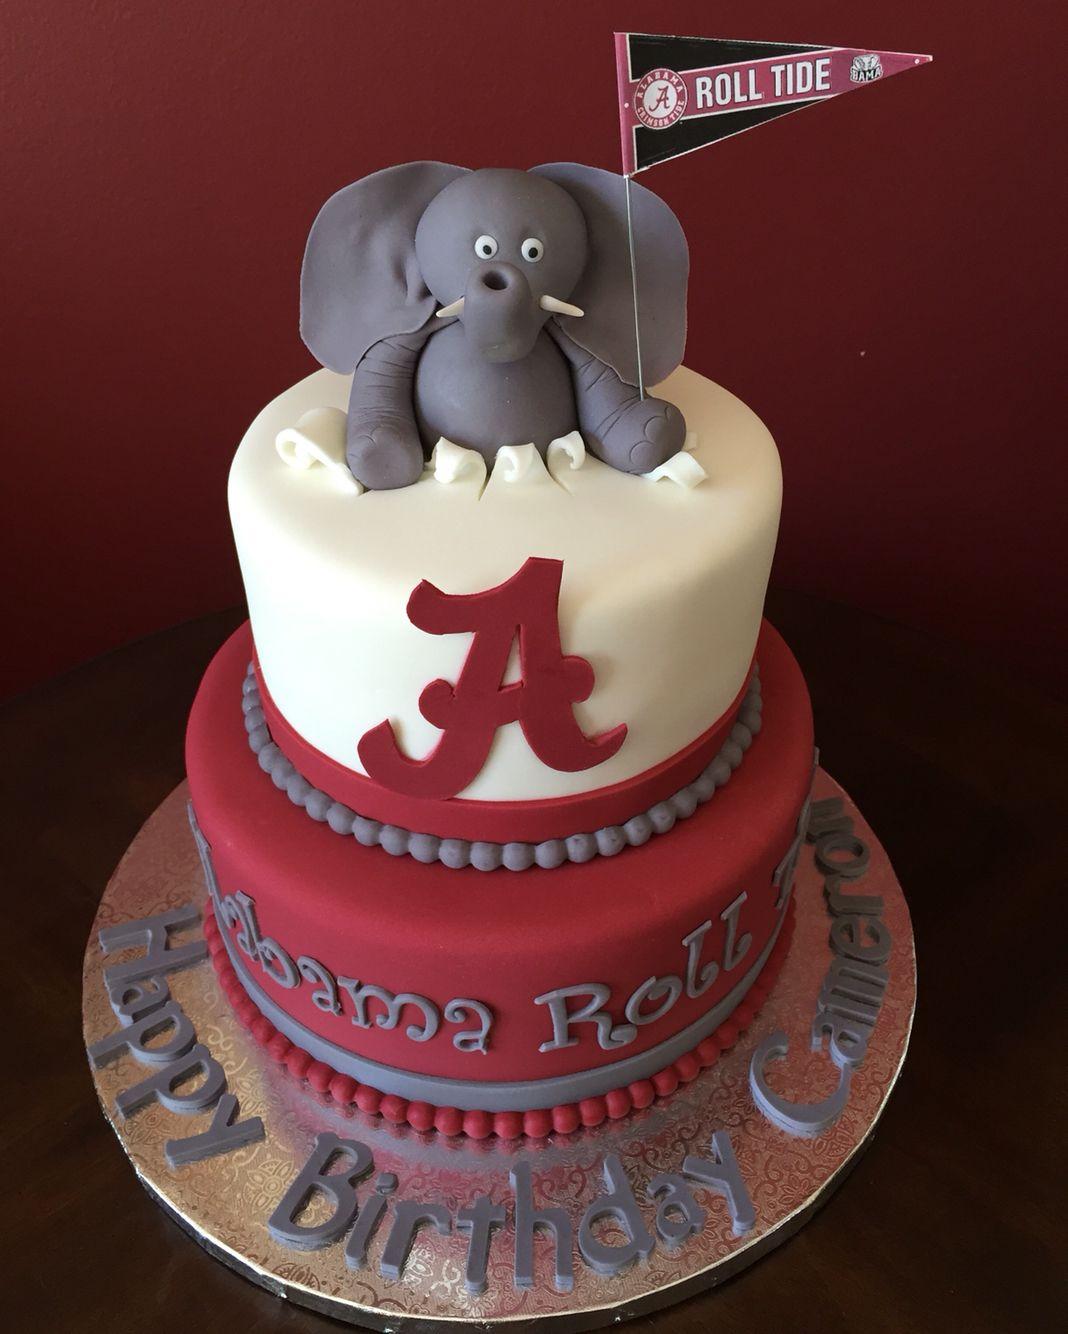 Astonishing University Of Alabama Roll Tide Birthday Cake Alabama Cakes Funny Birthday Cards Online Overcheapnameinfo